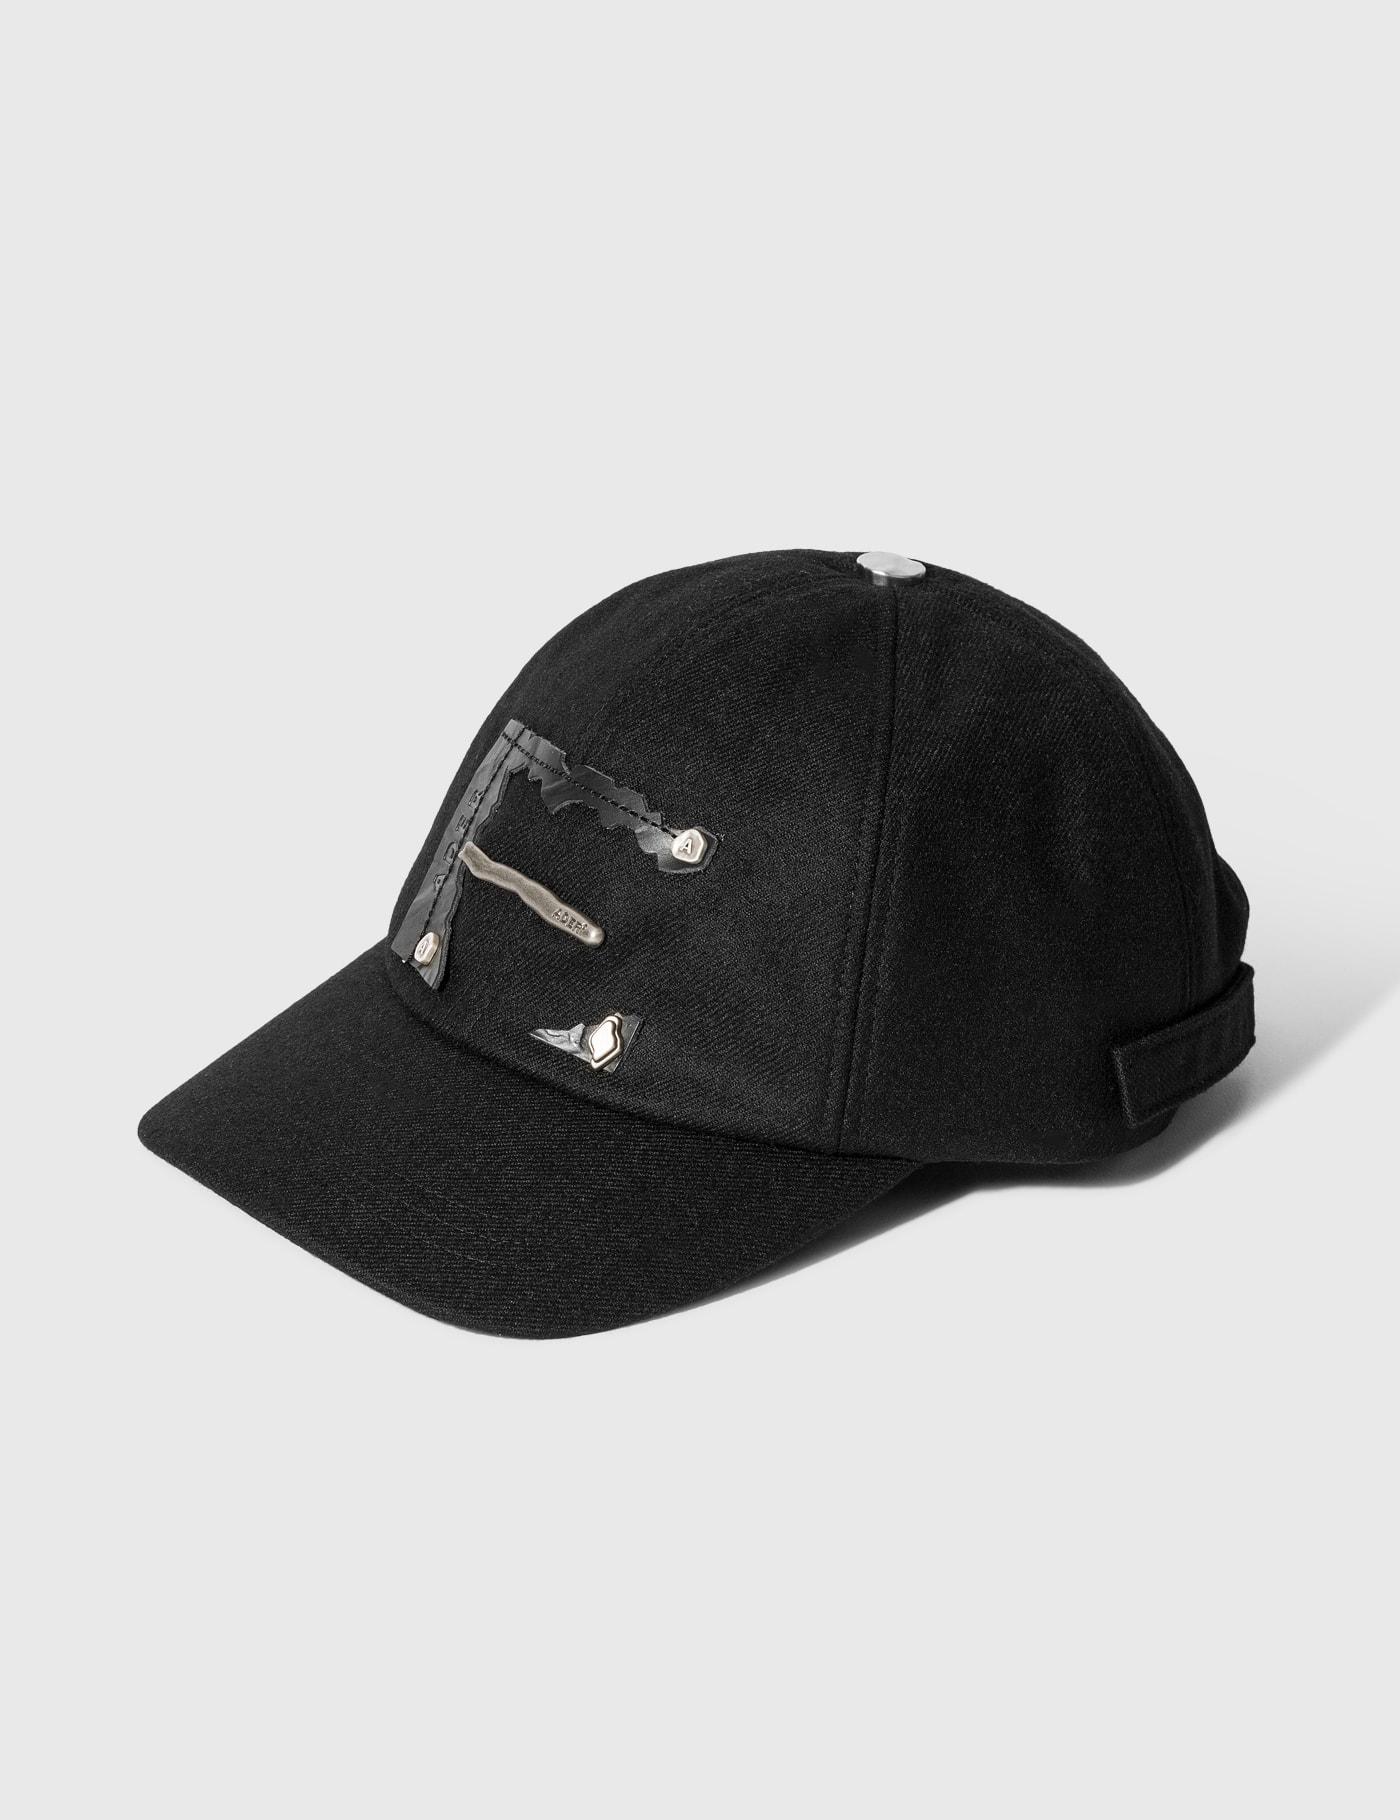 Ader Error TORN LABEL CAP